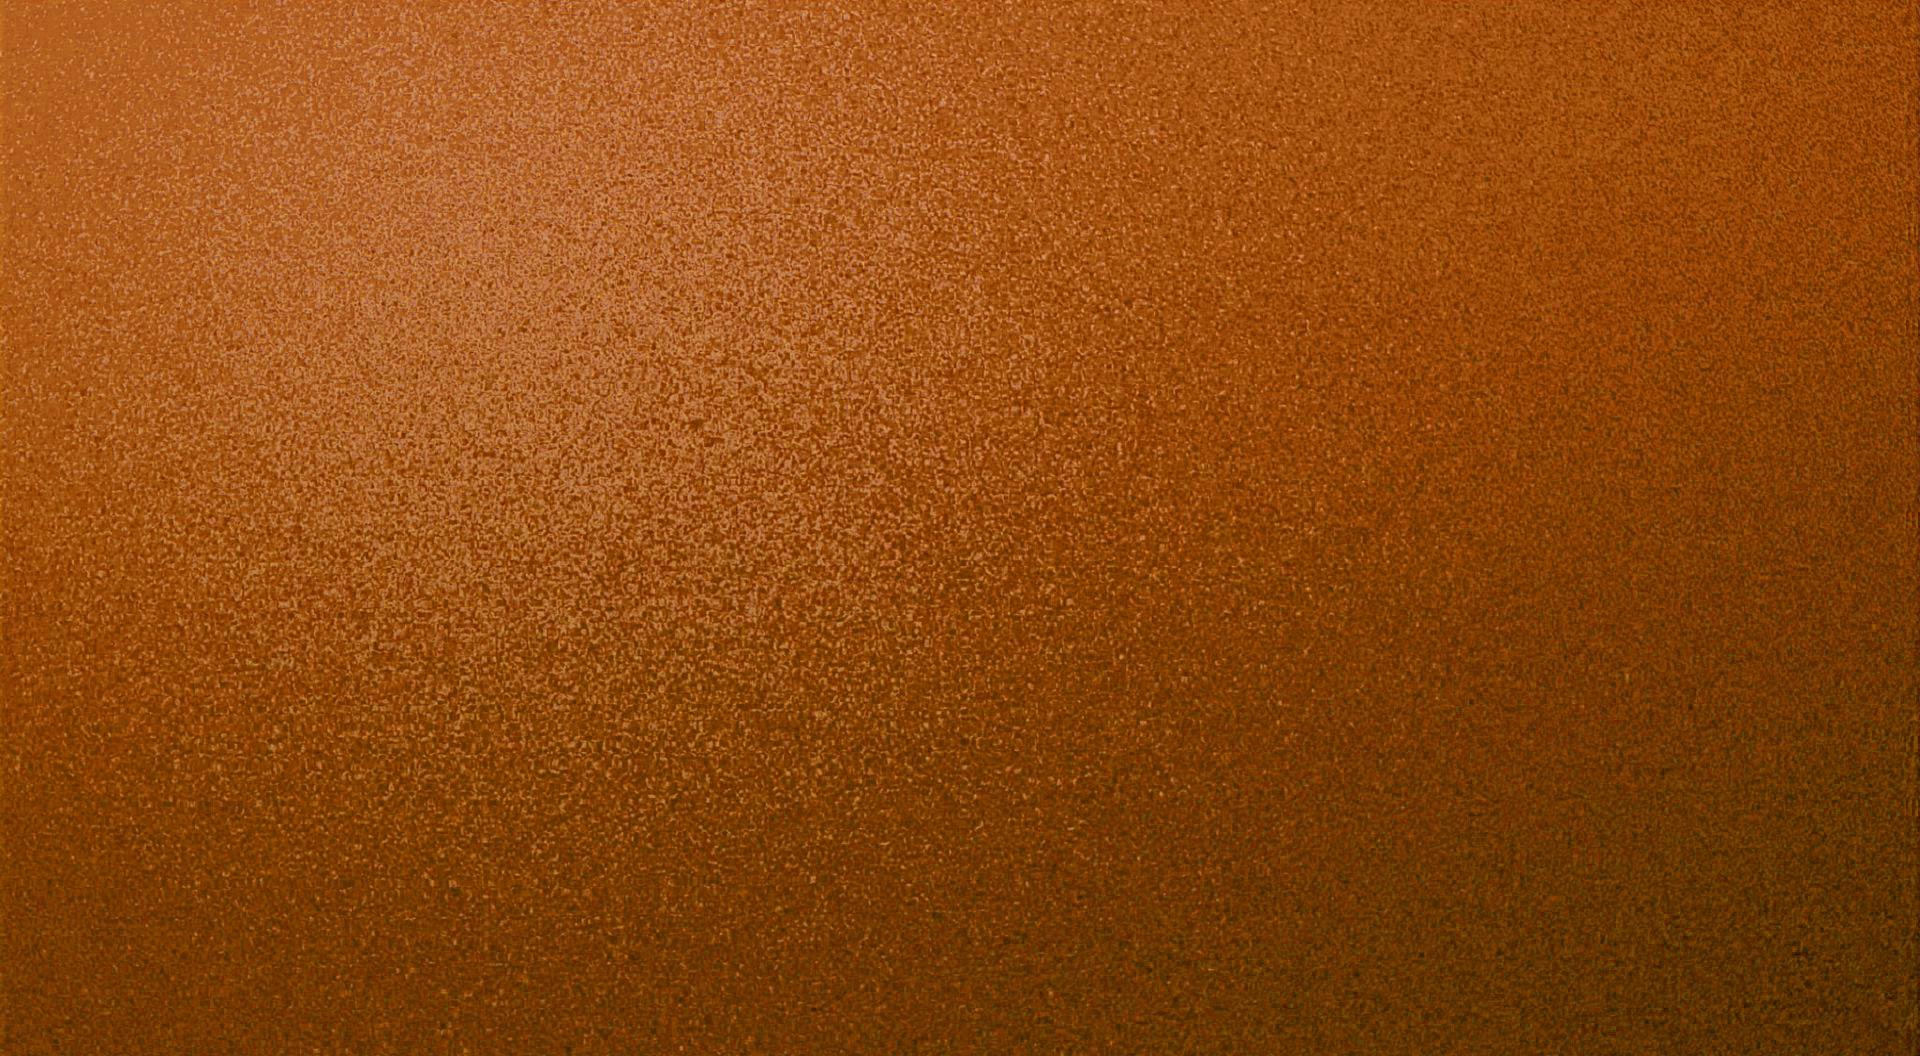 Orange textured speckled desktop background wallpaper for use with Mac 1920x1056